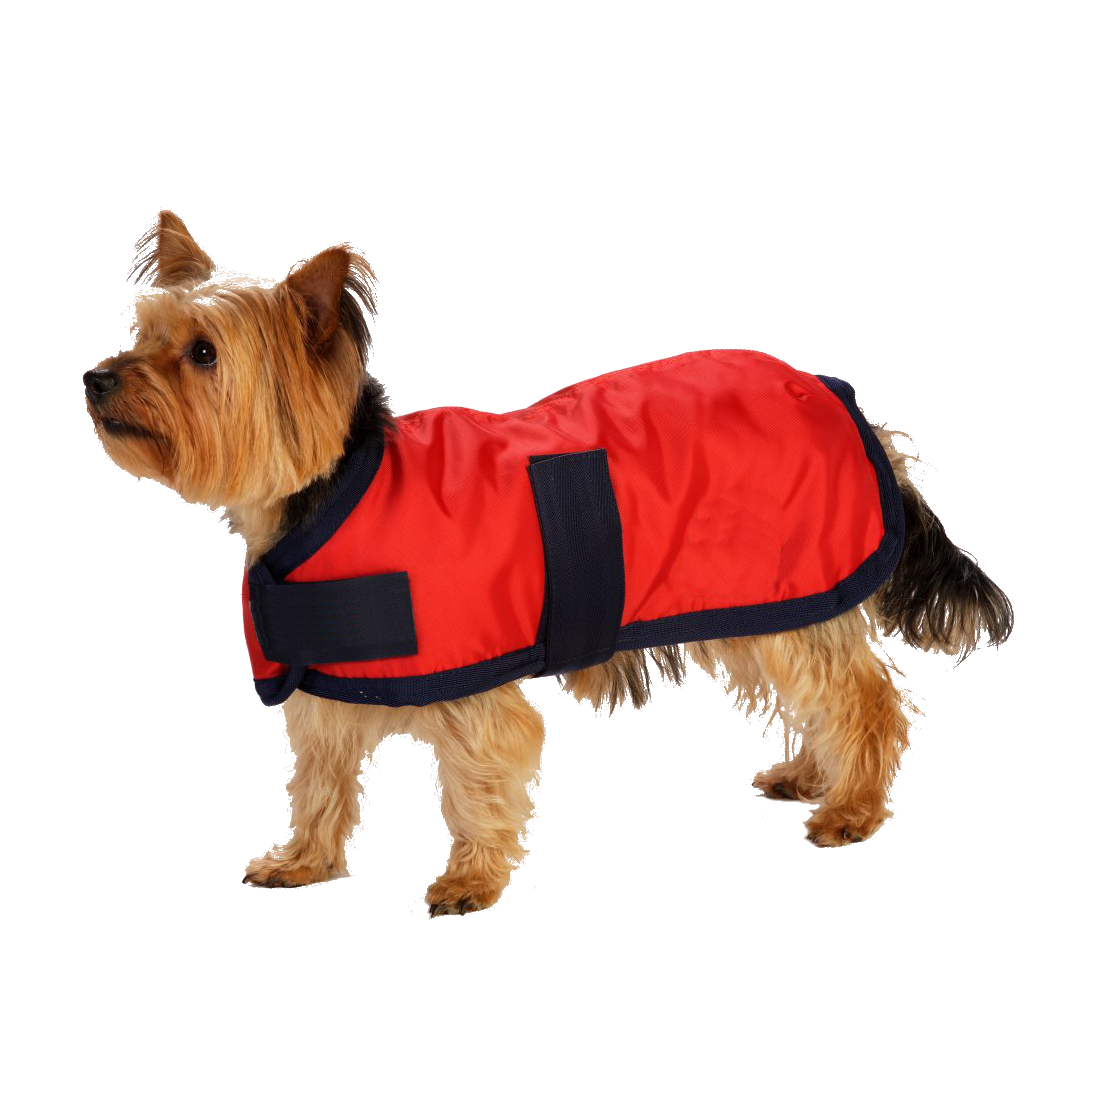 Warm Dog Jackets Winter photo - 3